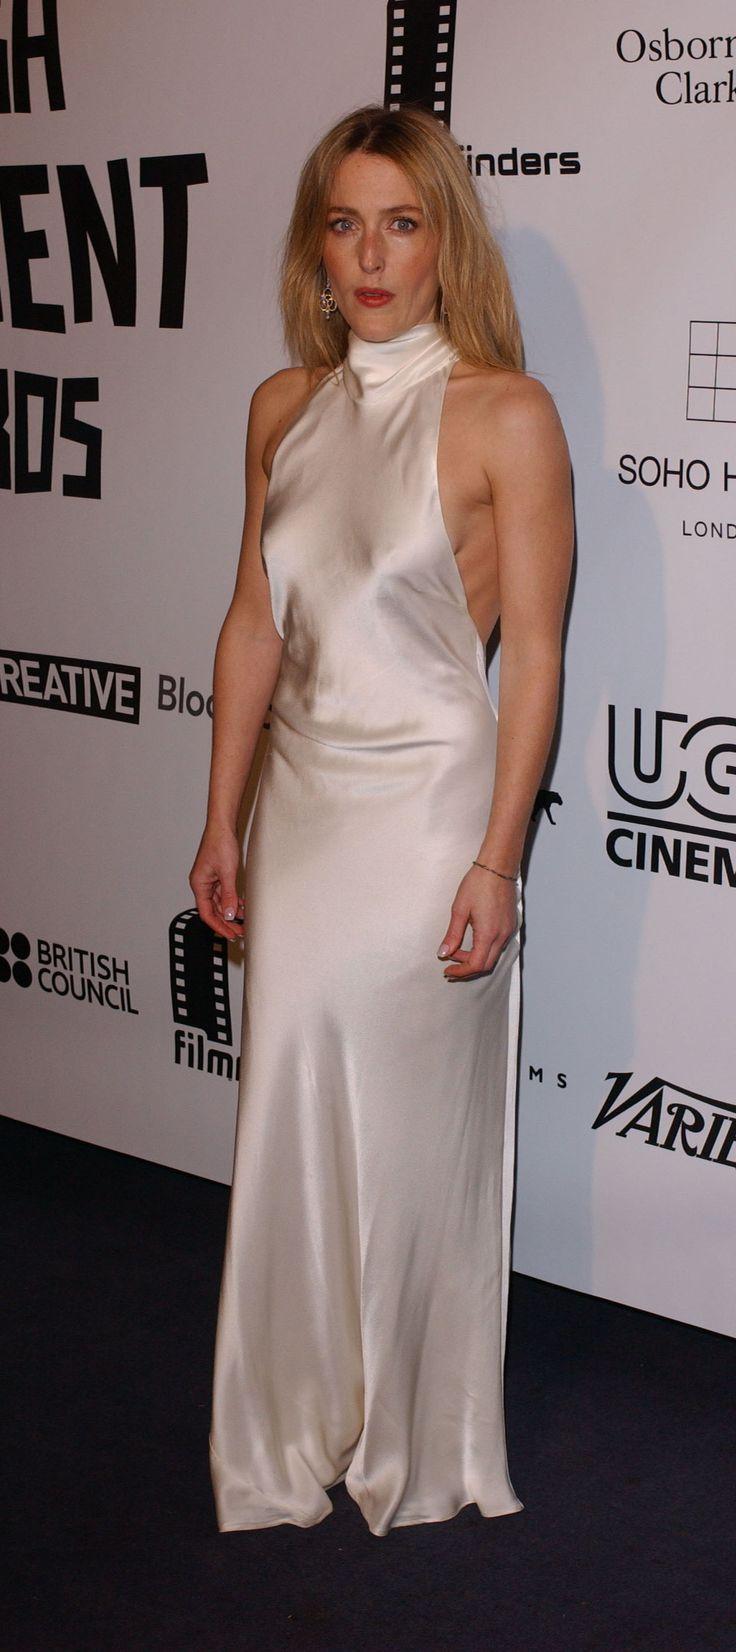 Gillian Anderson Nude X-Files Photos - Celeb Masta